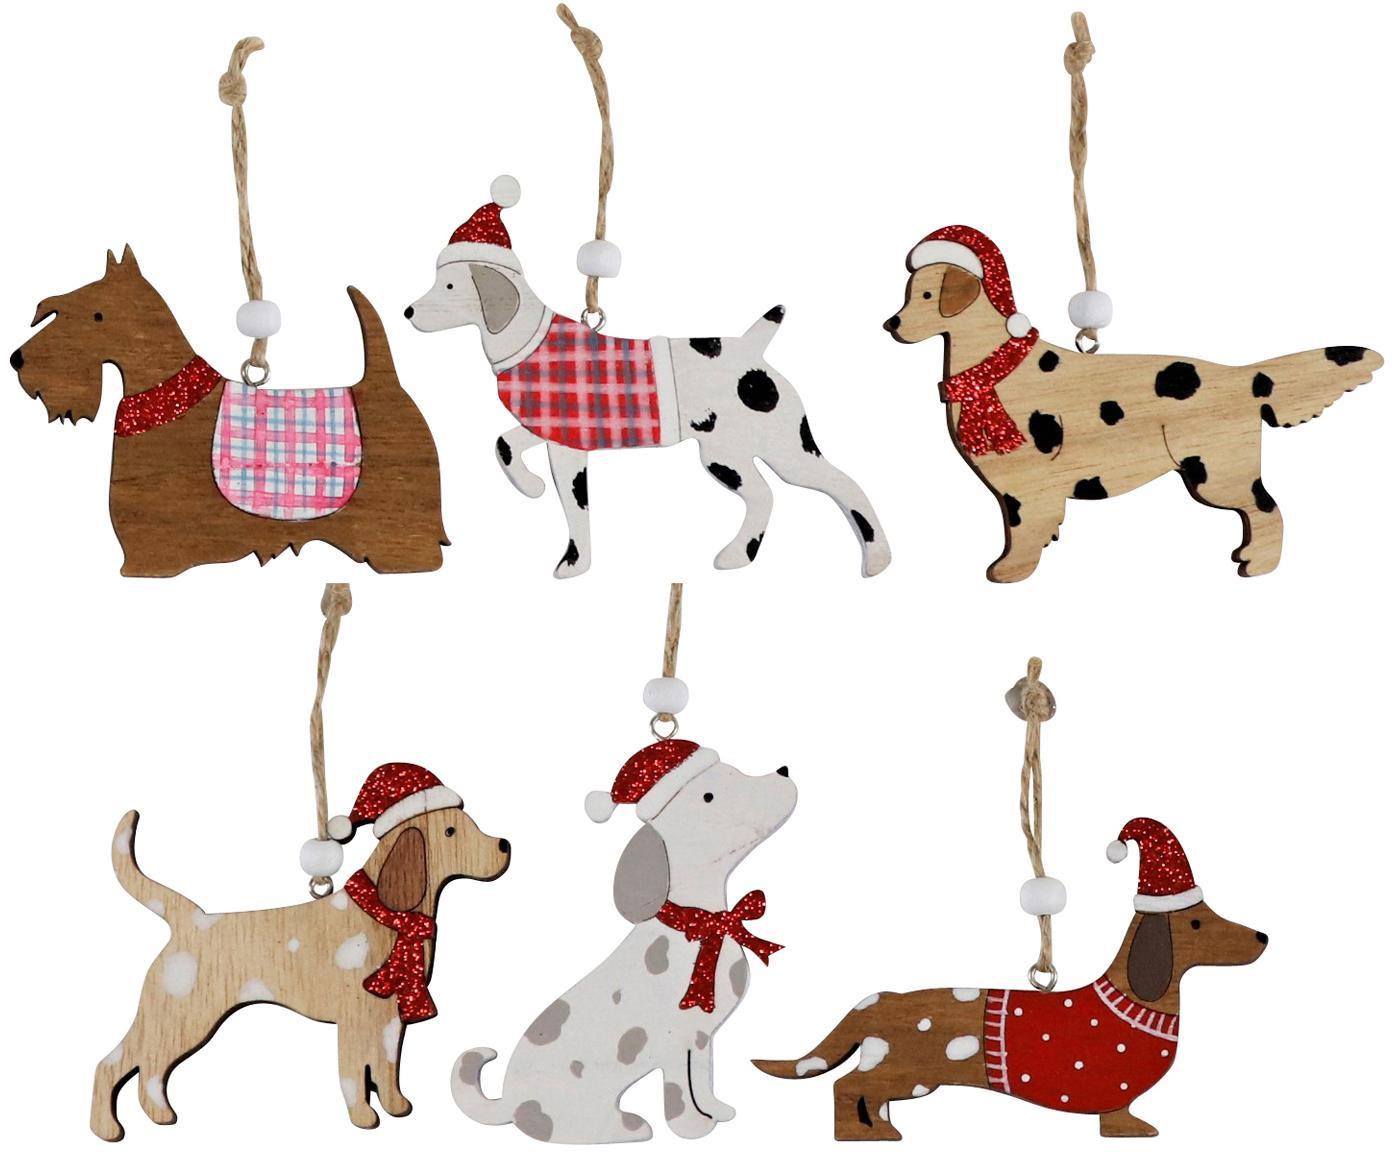 Houten kerstboomhangersset Christmas Dogs, 12-delig, Hout, Multicolour, 11 x 8 cm